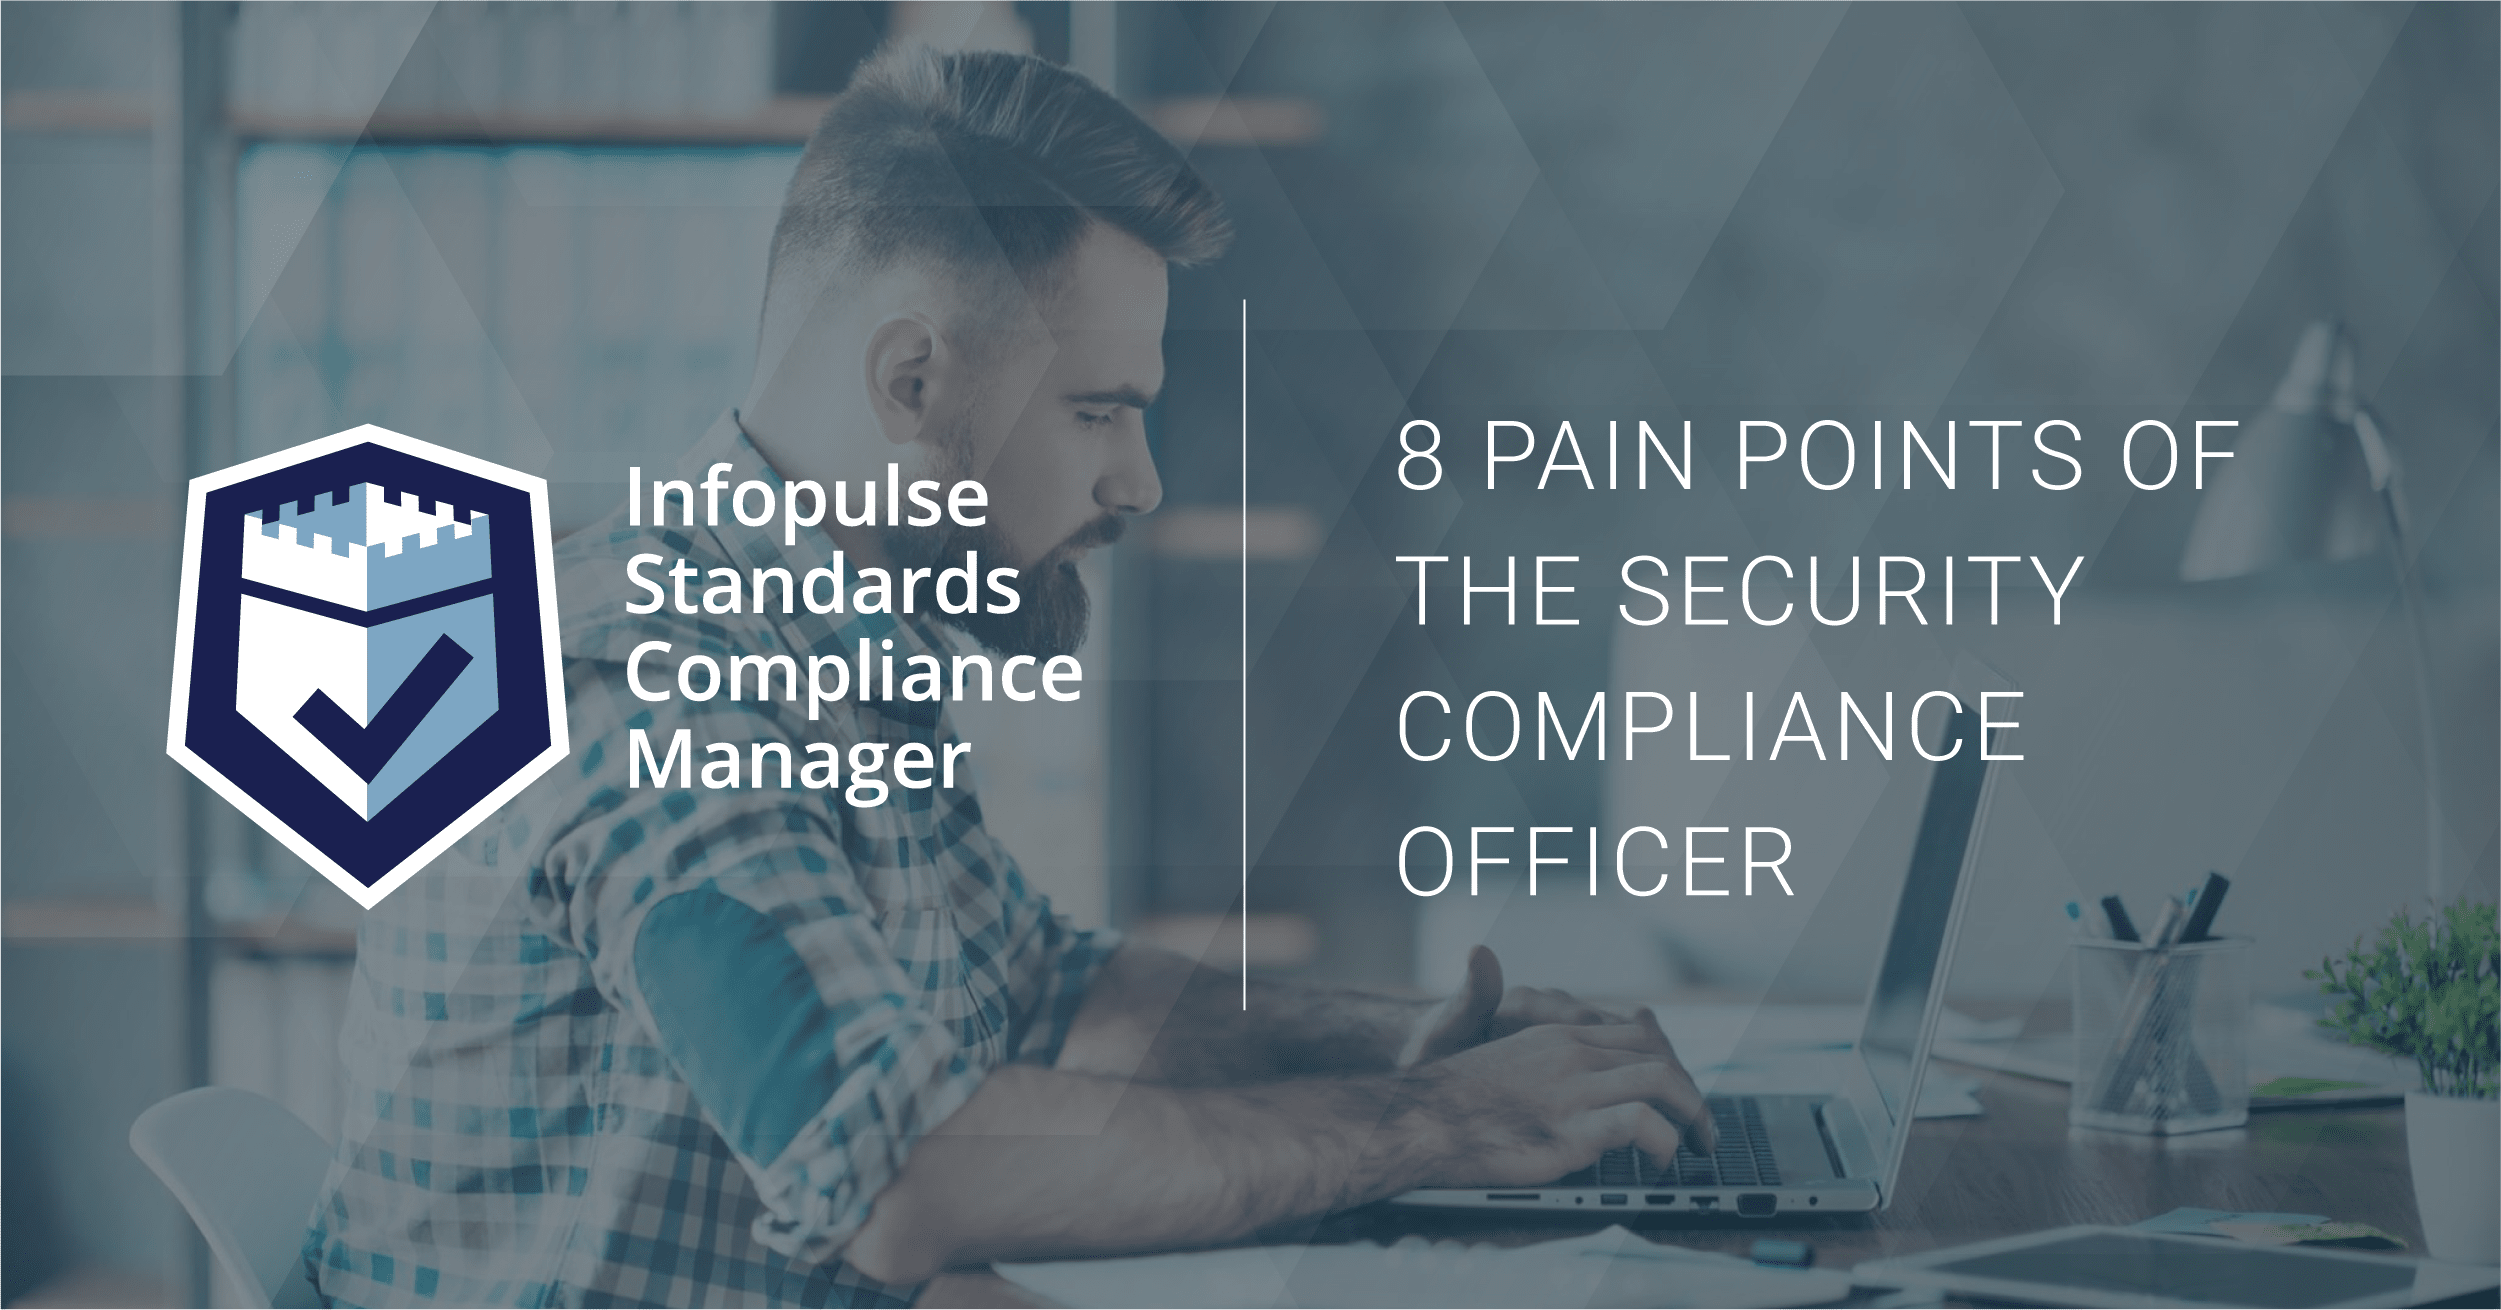 Compliance officer GRC solution Infopulse SCM